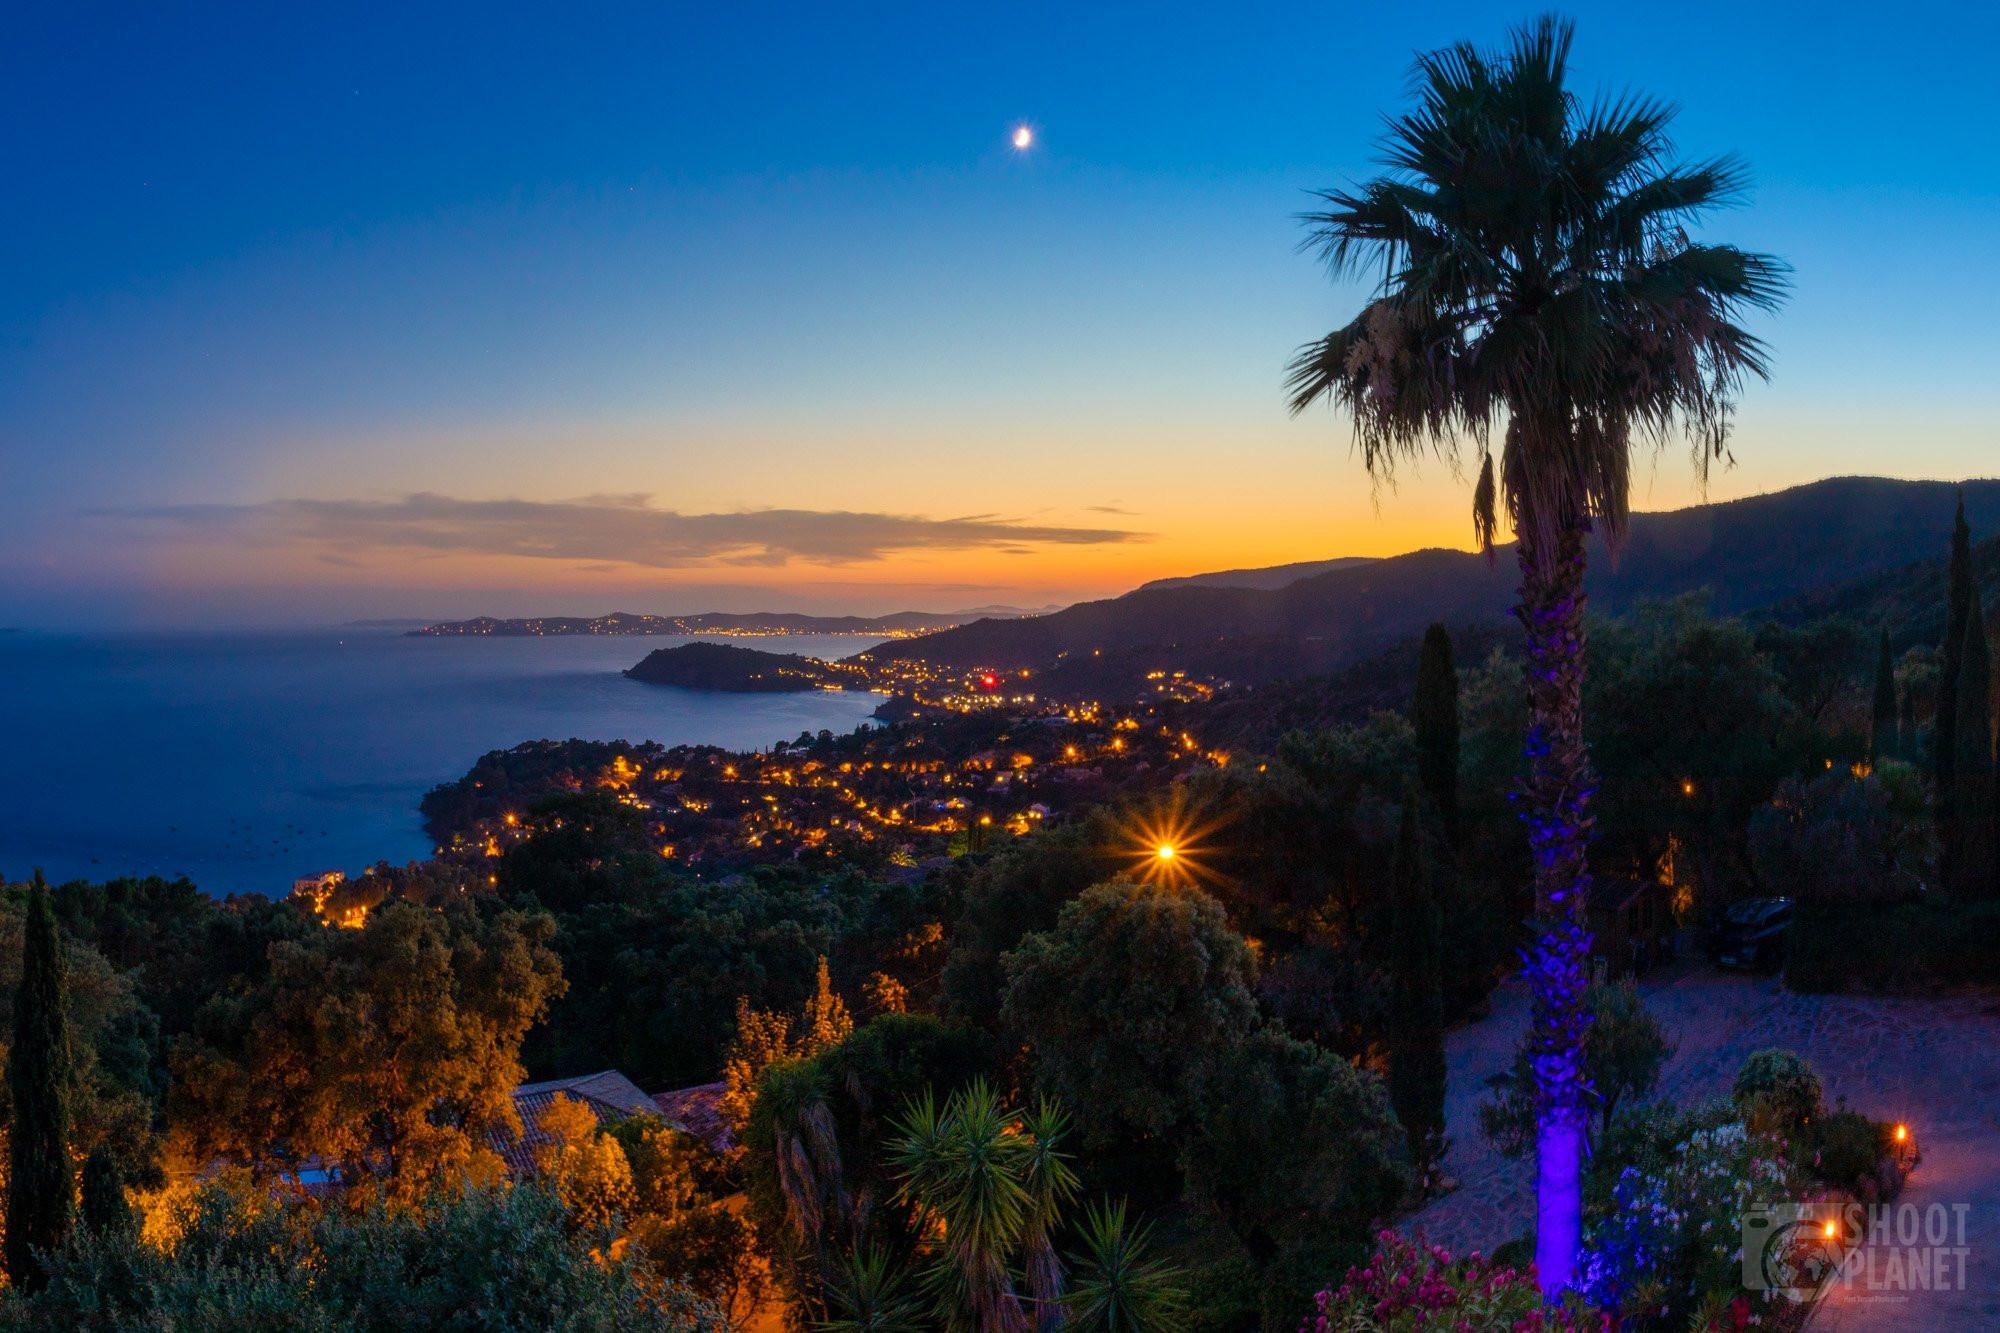 Sunset from Visatzur villa, Azure coast France